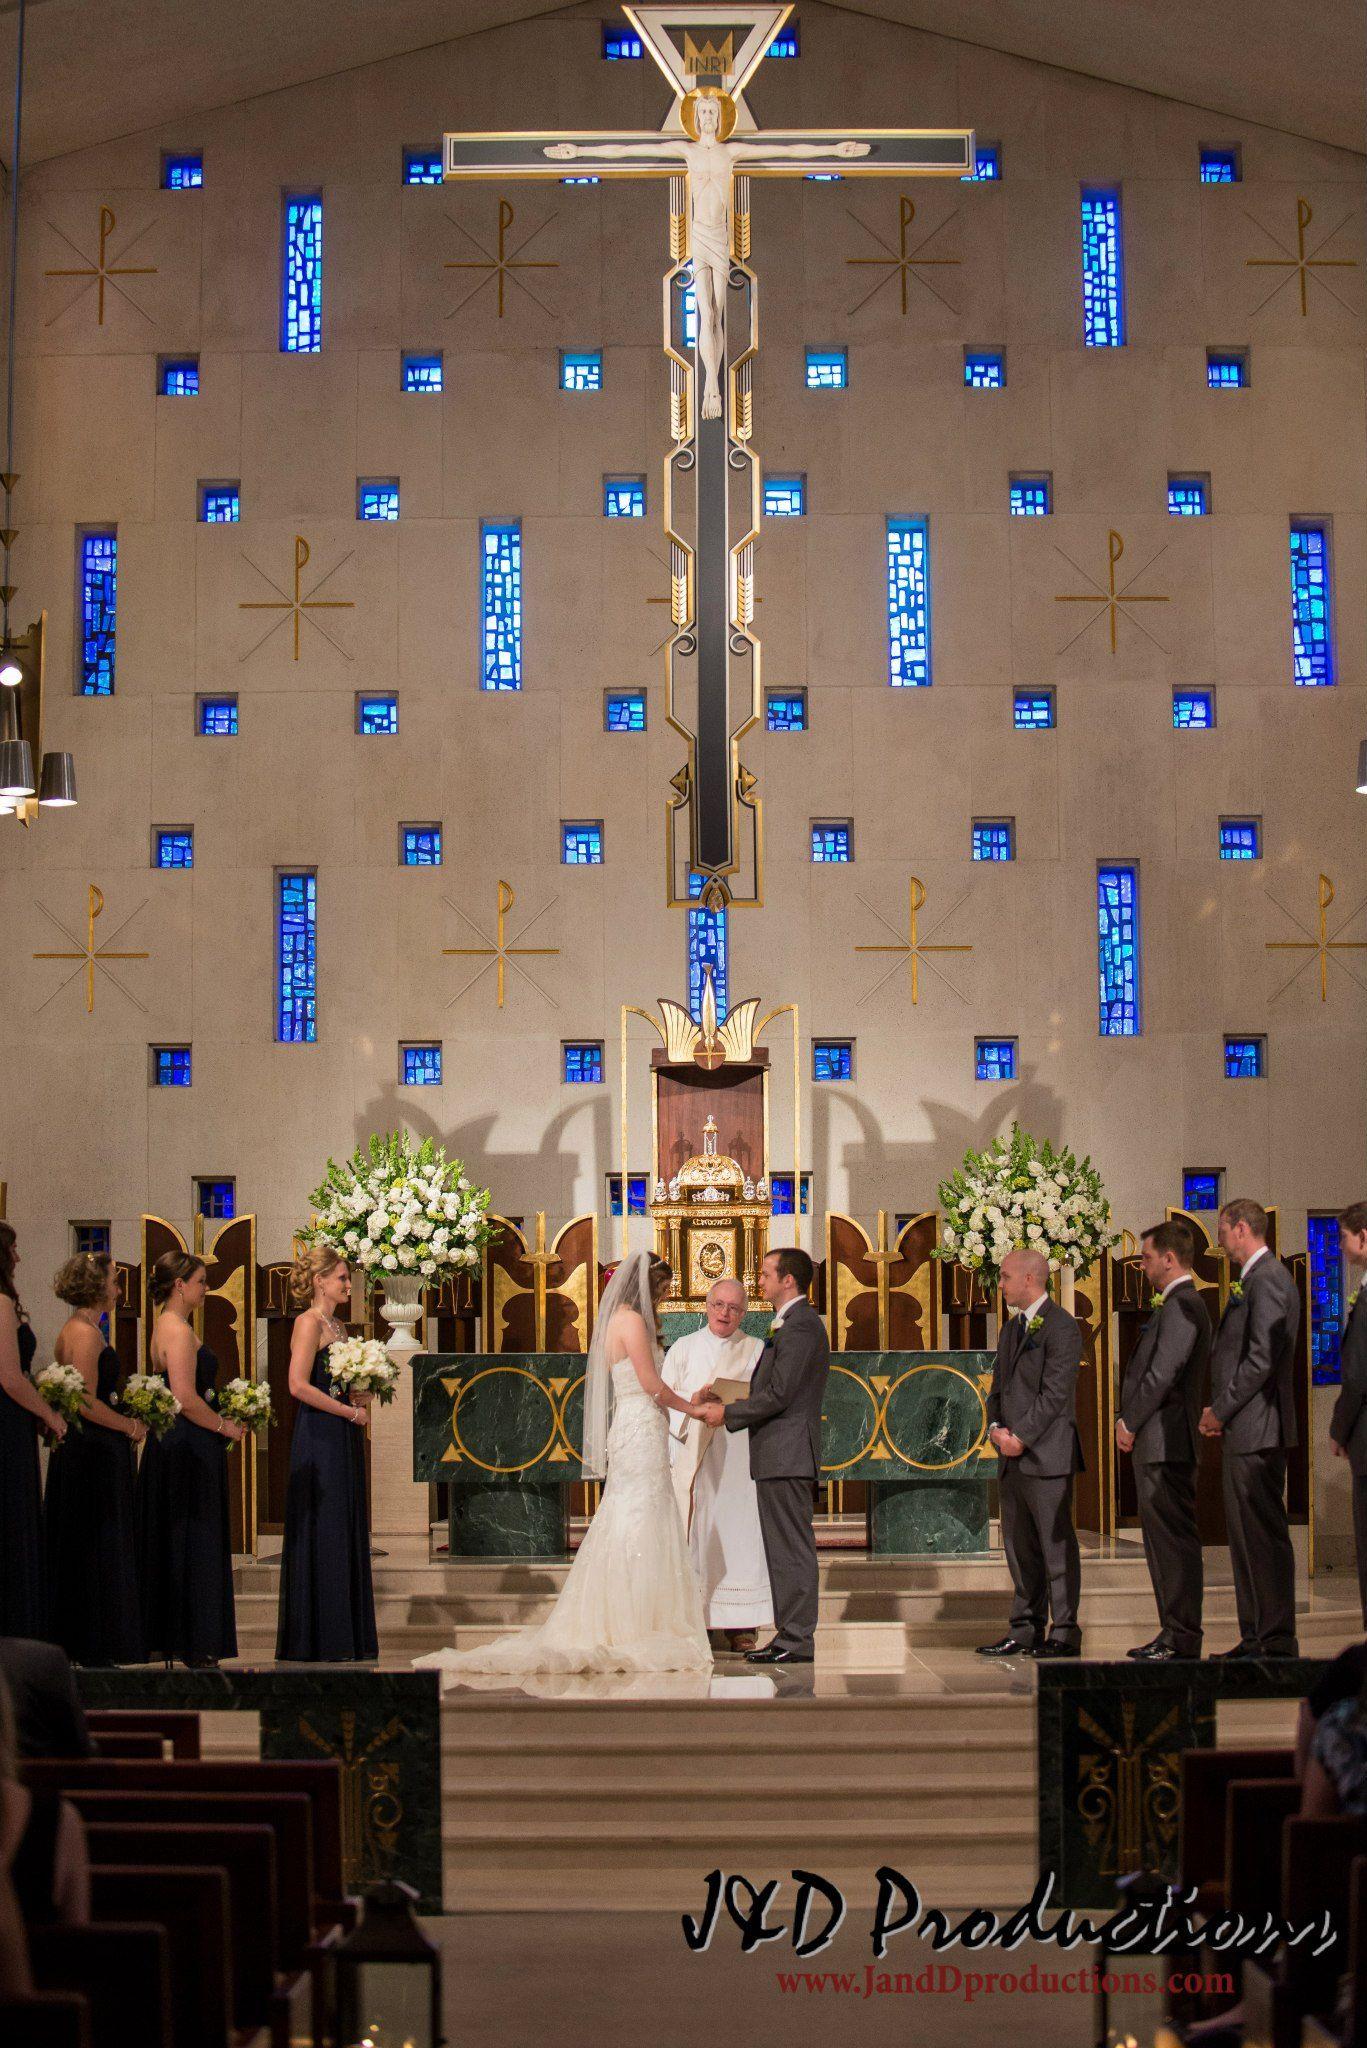 Jennifer And Andrew S Wedding At St Michael Catholic Church In Houston Tx Texasweddingvenues Fabuloustexasweddingvenues Weddings Texasweddings